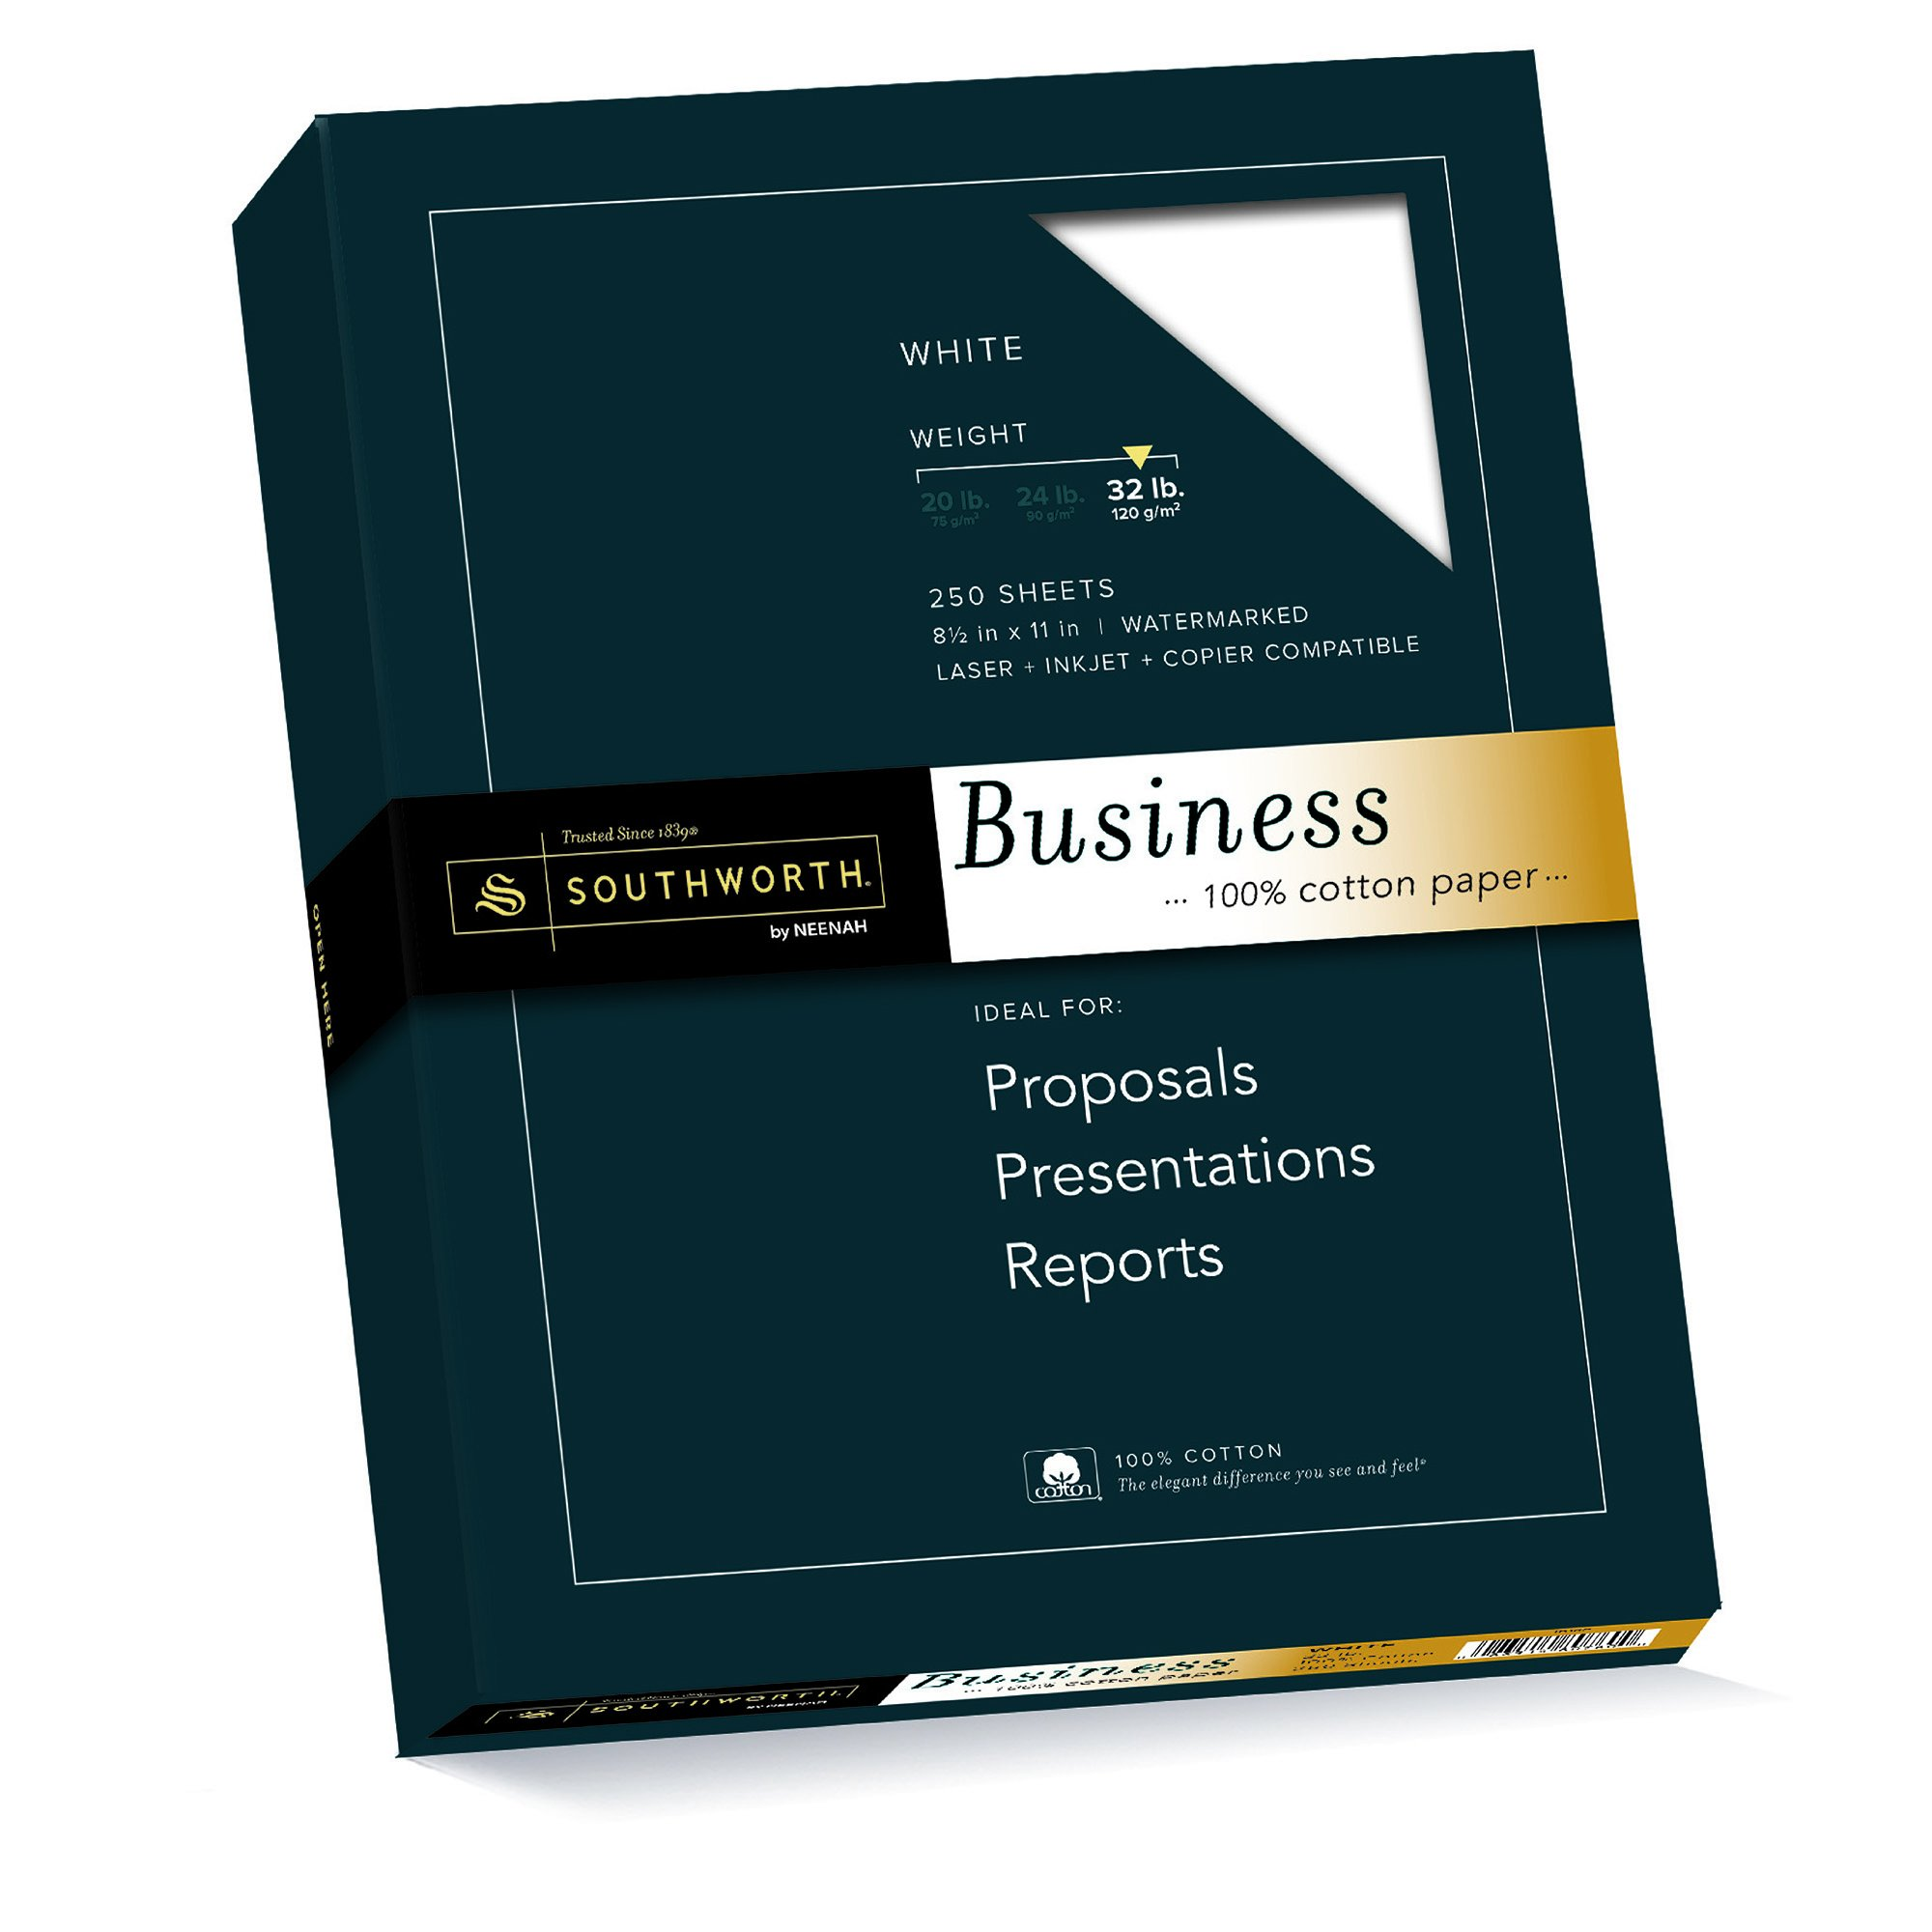 Southworth 100% Cotton Business Paper, 8.5''x11'', 32 lb, White, 1500 sheets (JD18C) by Southworth